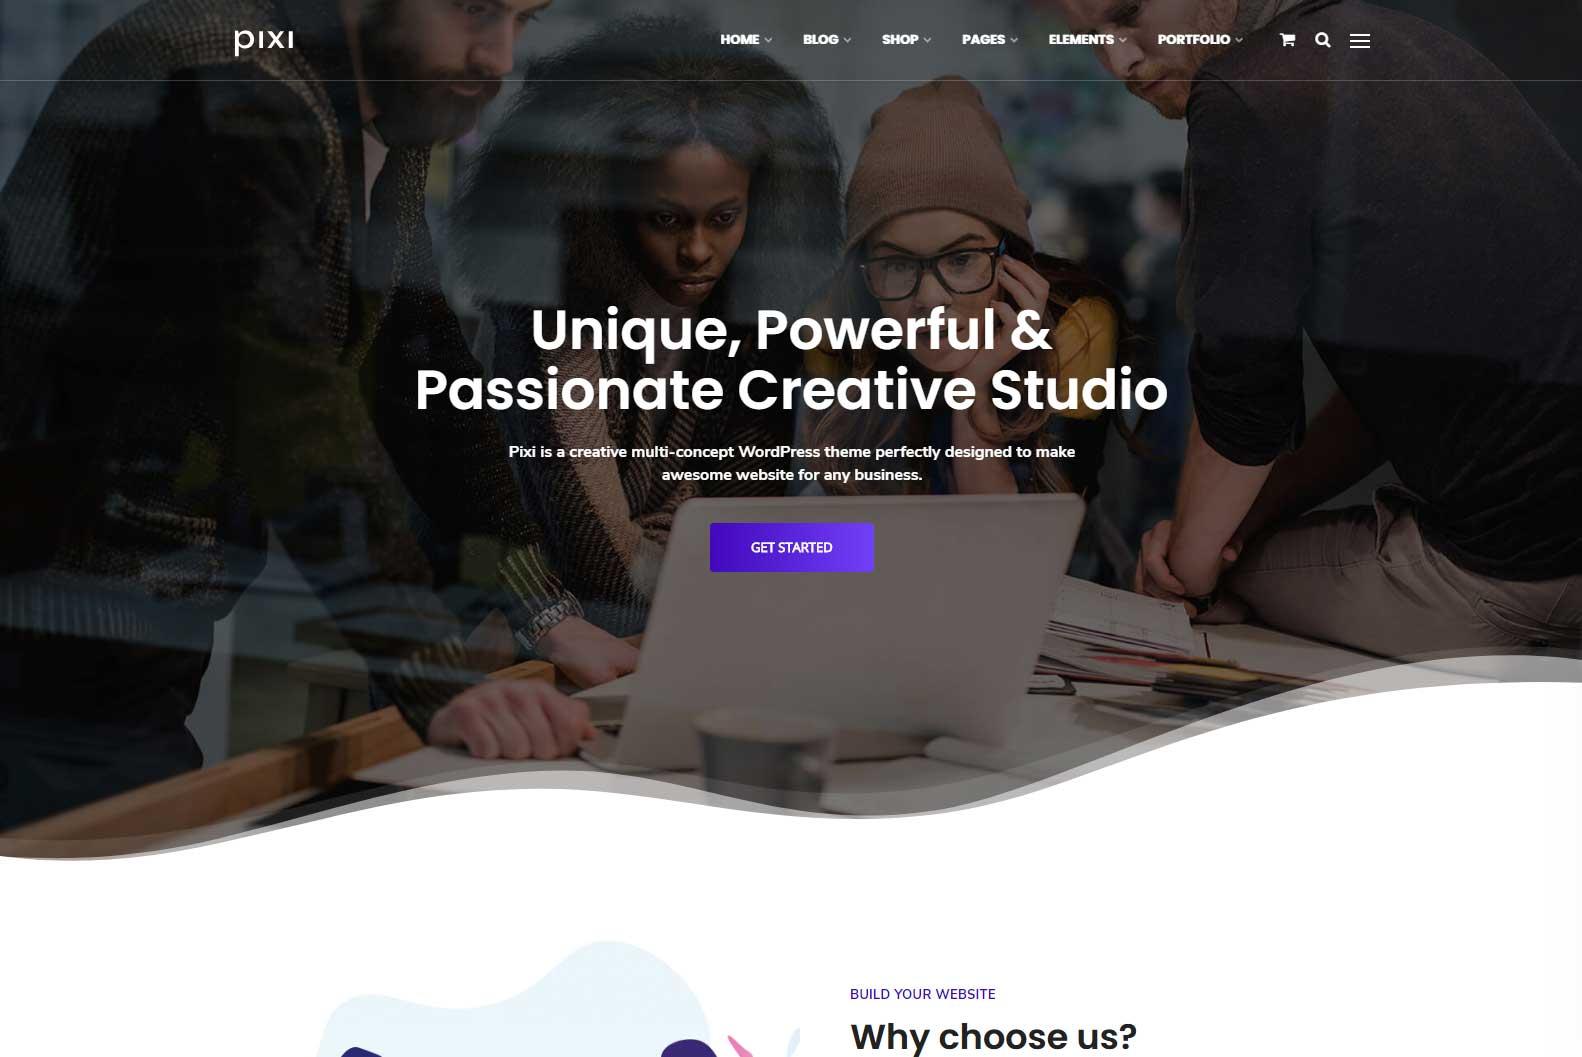 Pixi Creative 10+ Best Envato WordPress Themes for Business, Portfolio, Creatives, Blog of 2019